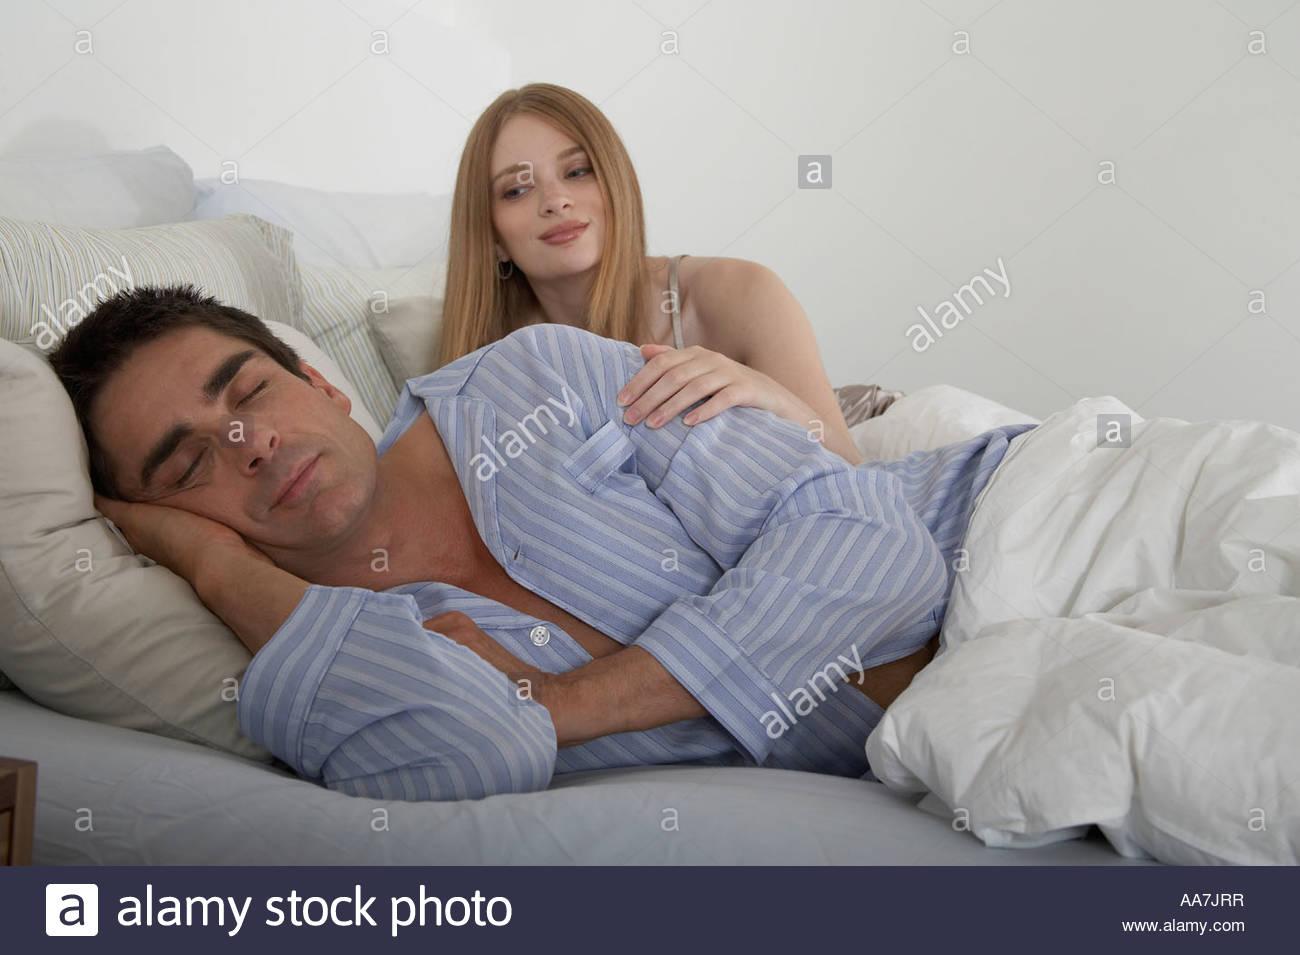 wife sleep with other man